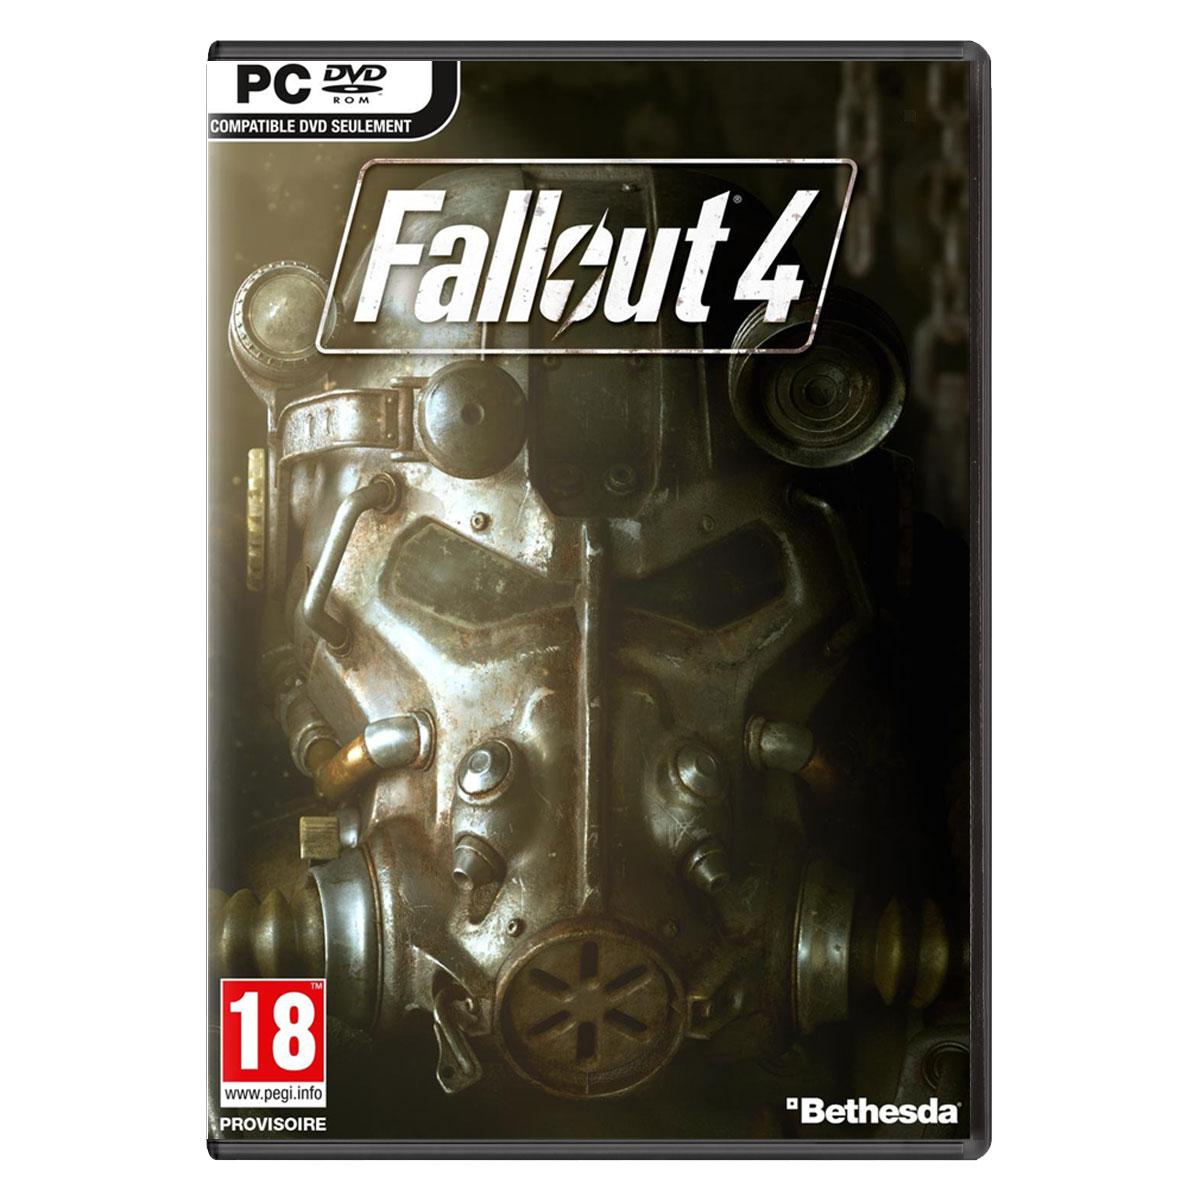 Jeux PC Fallout 4 (PC) Fallout 4 (PC)